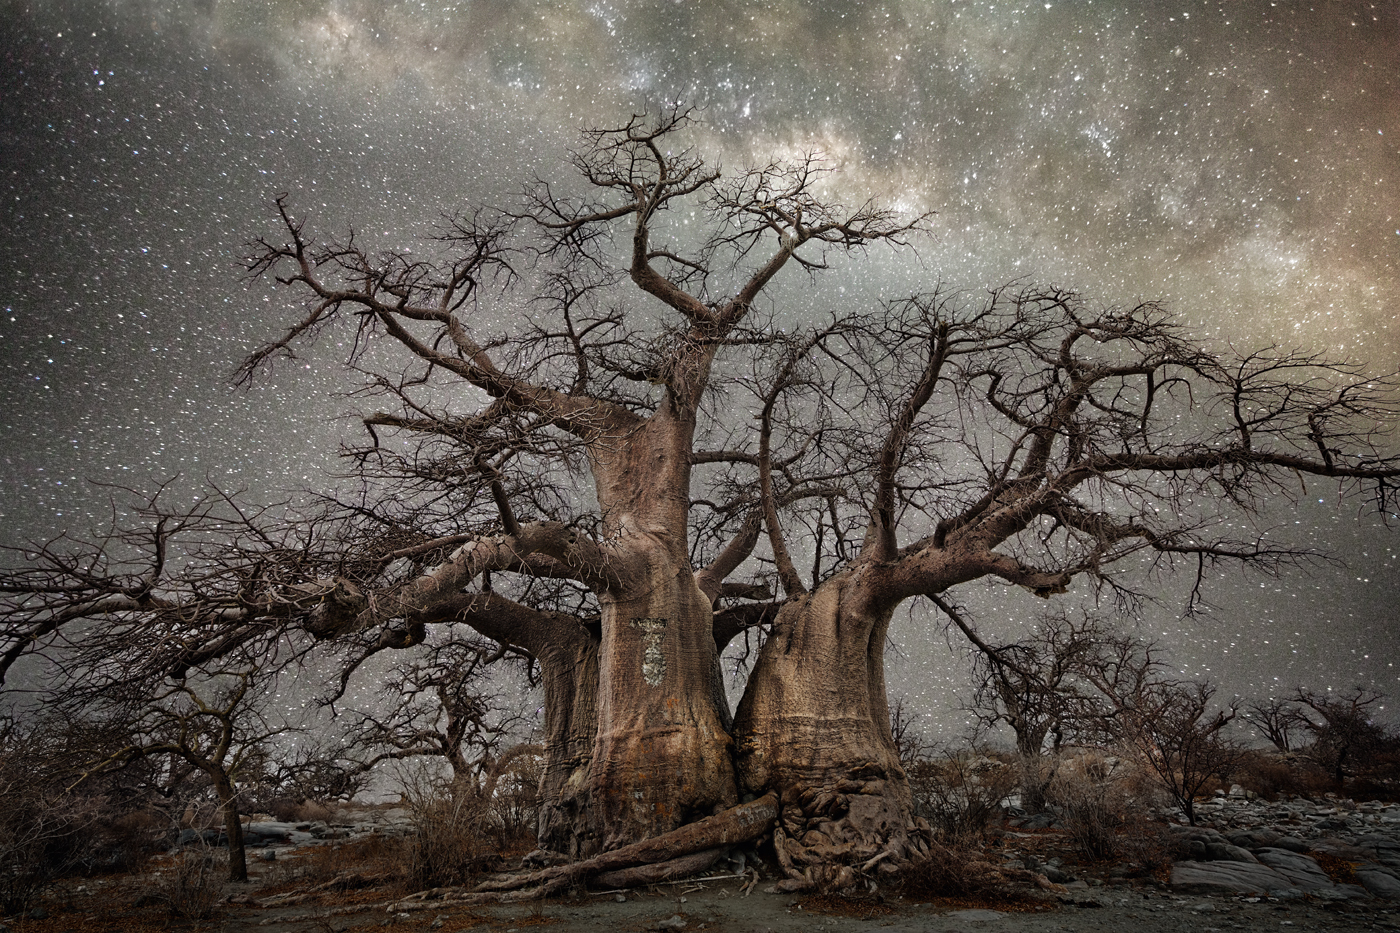 beth-moon-vieu-arbre-etoile-05